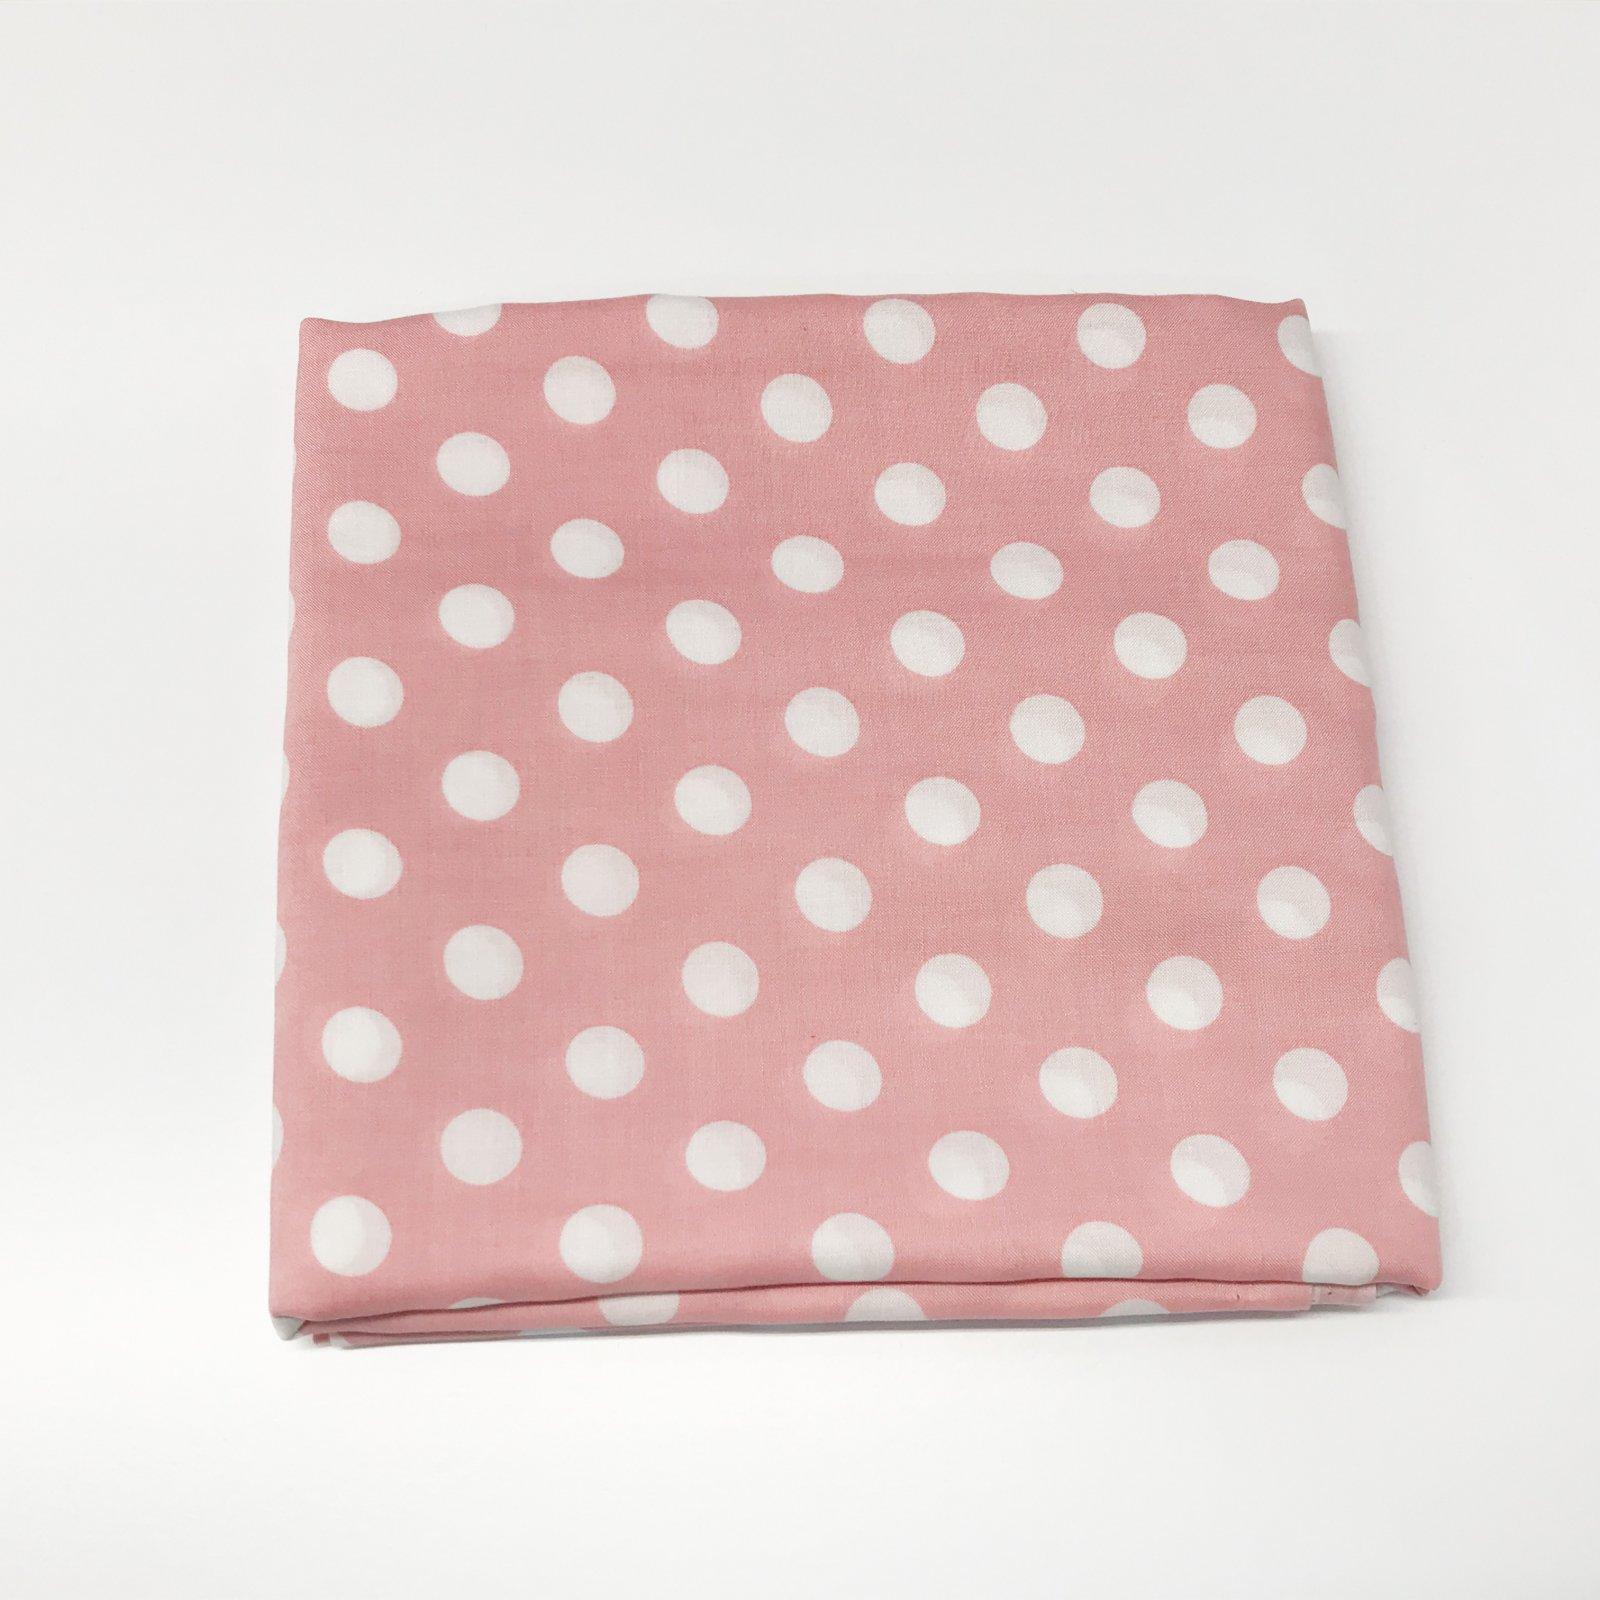 1 7/8 yards - Rayon - White Polka Dots on Pink